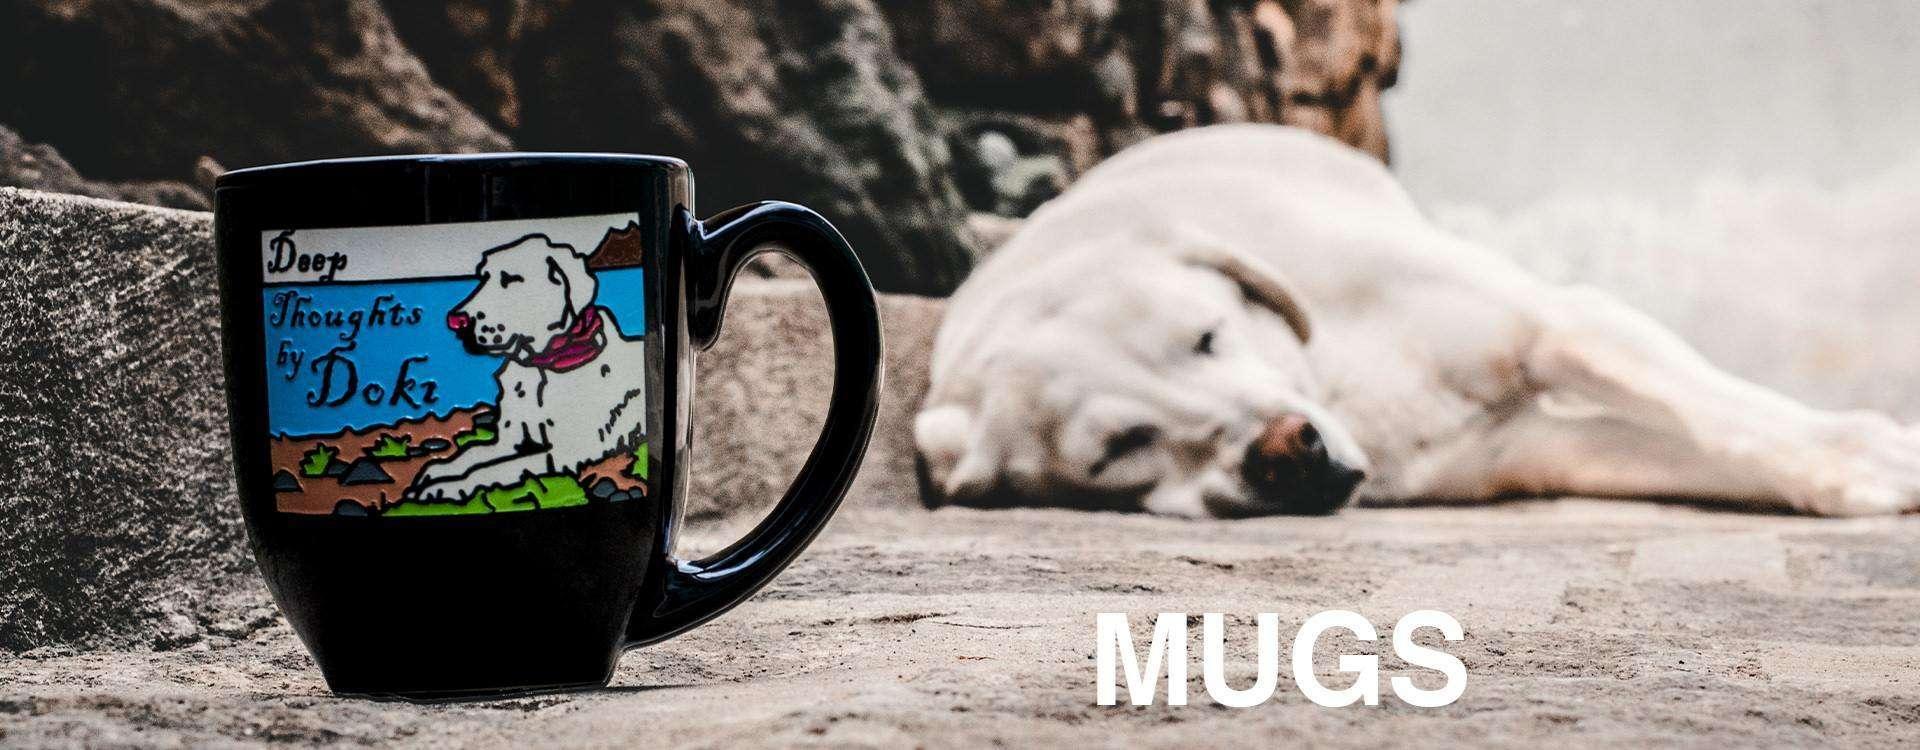 "White dog sleeps on street beside engraved, hand-painted ceramic coffee mug with overlaid text: ""MUGS"""